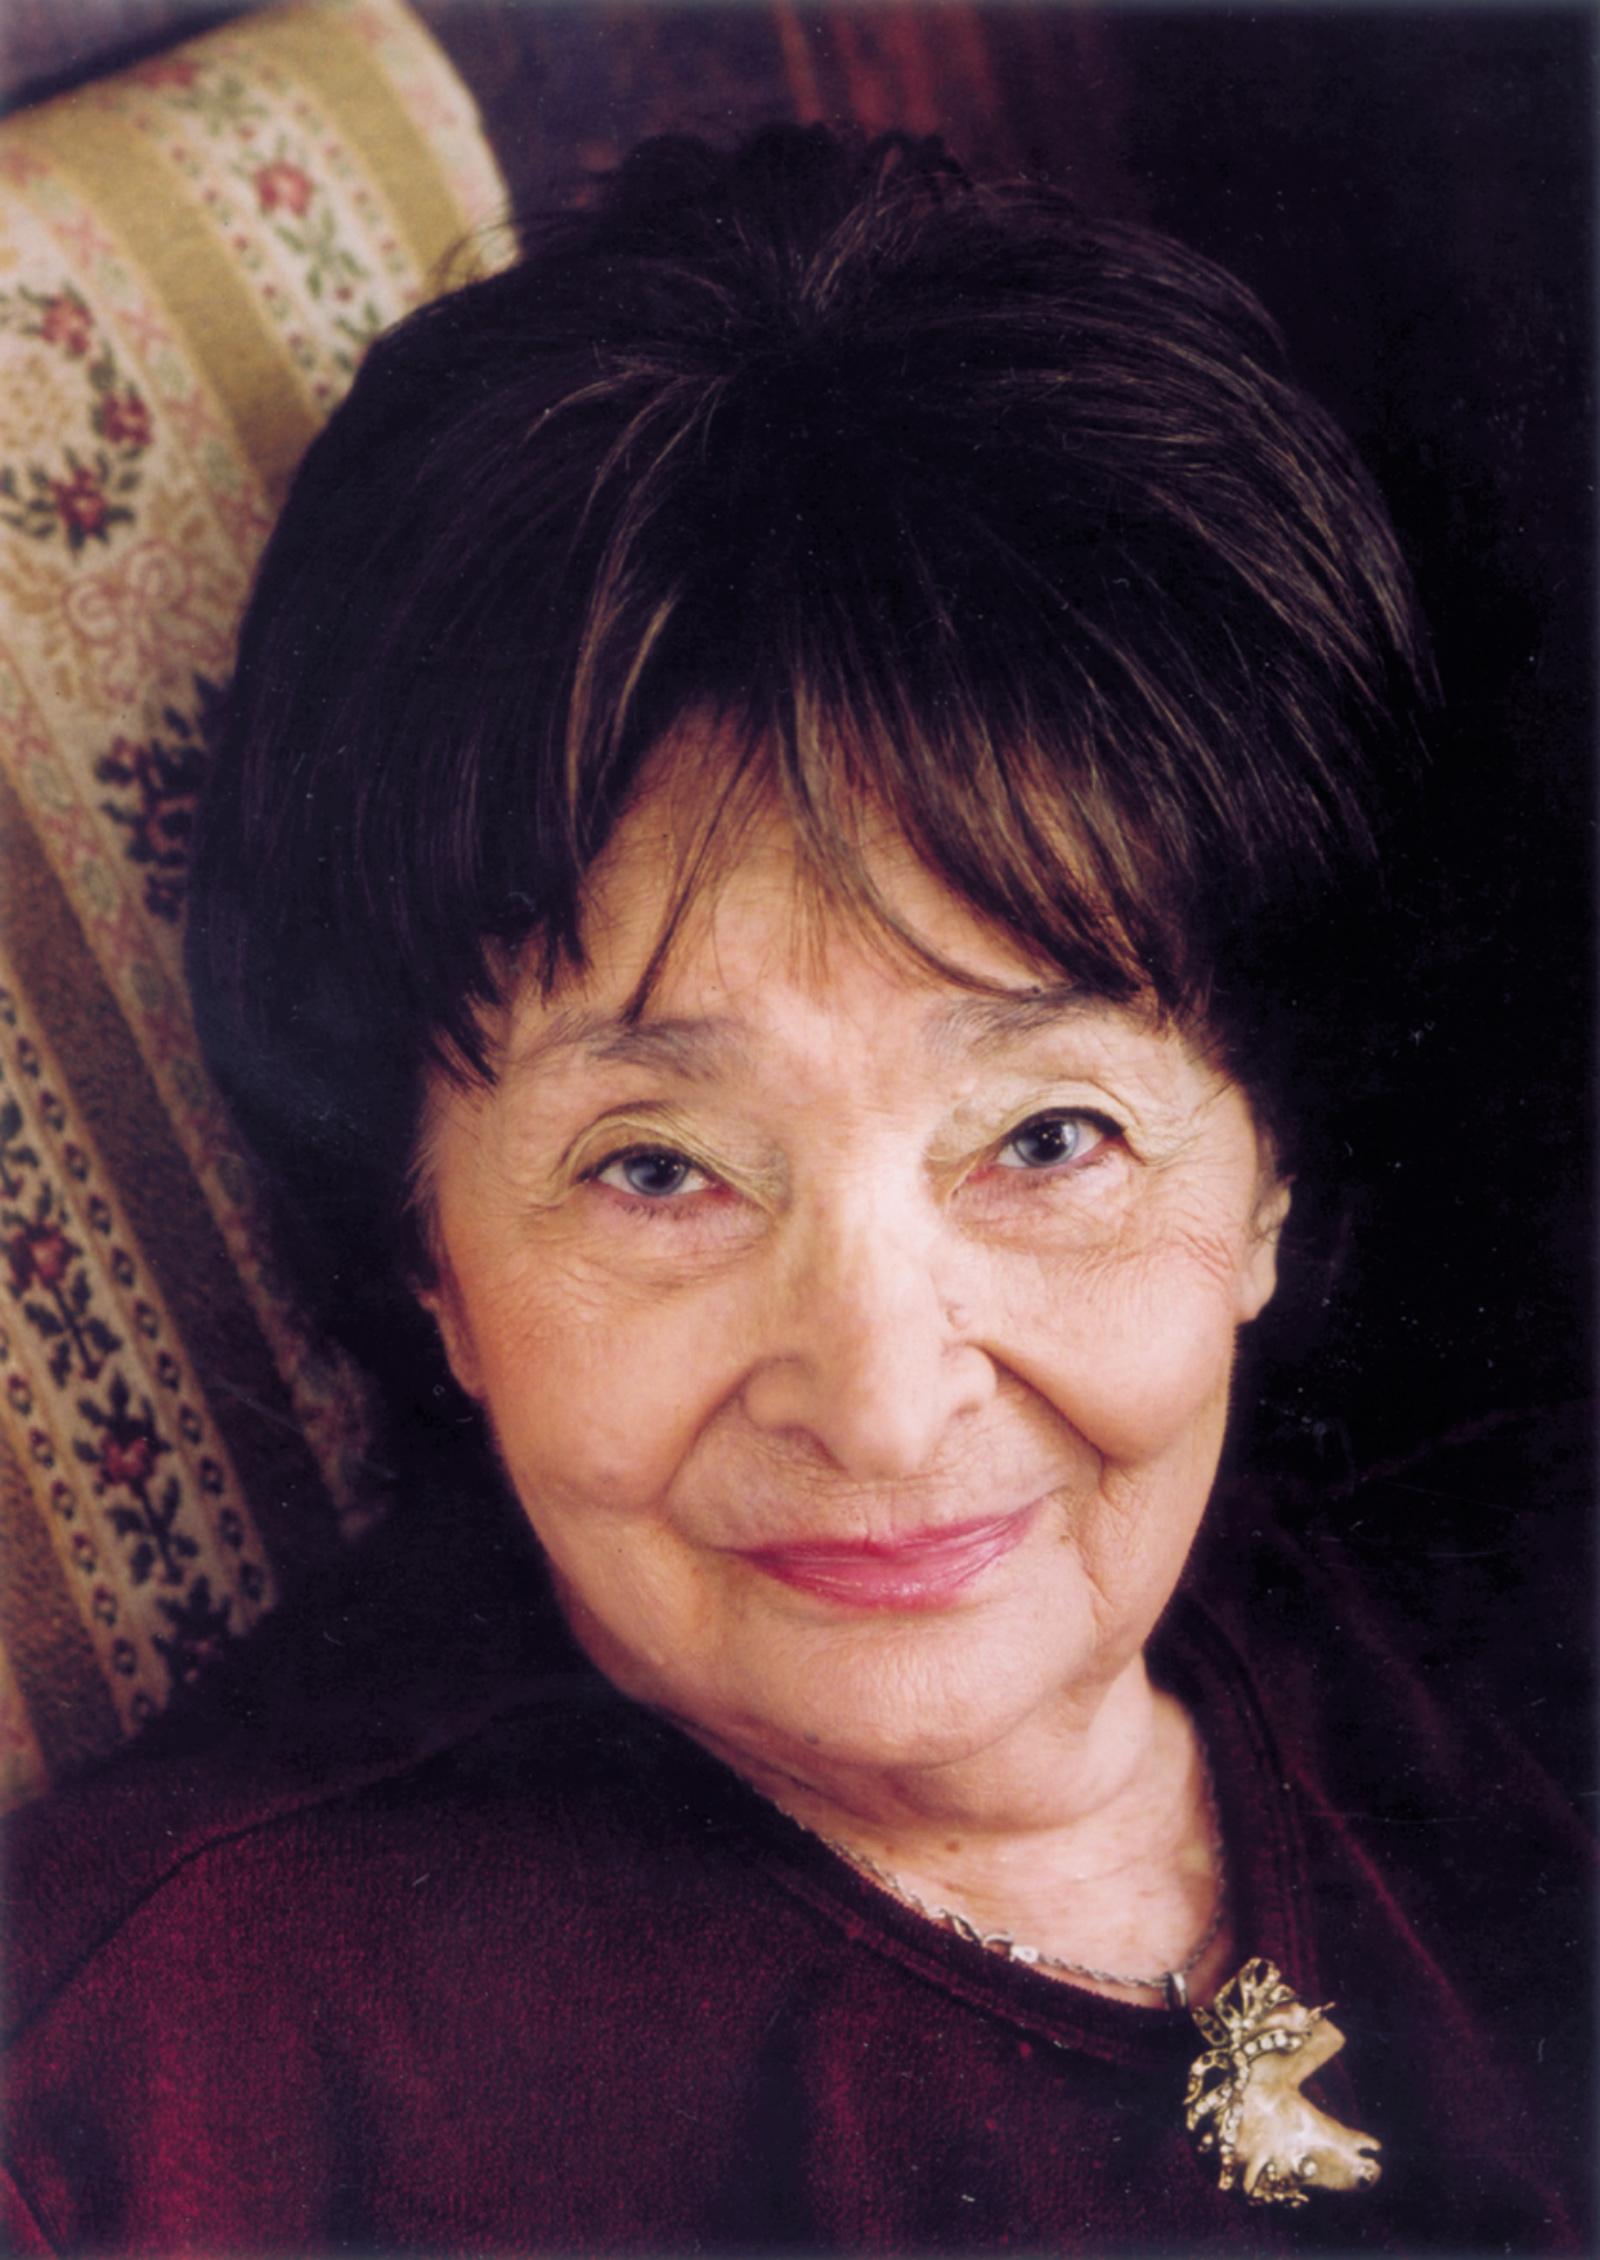 Magda Szabó, Budapest, circa 2003